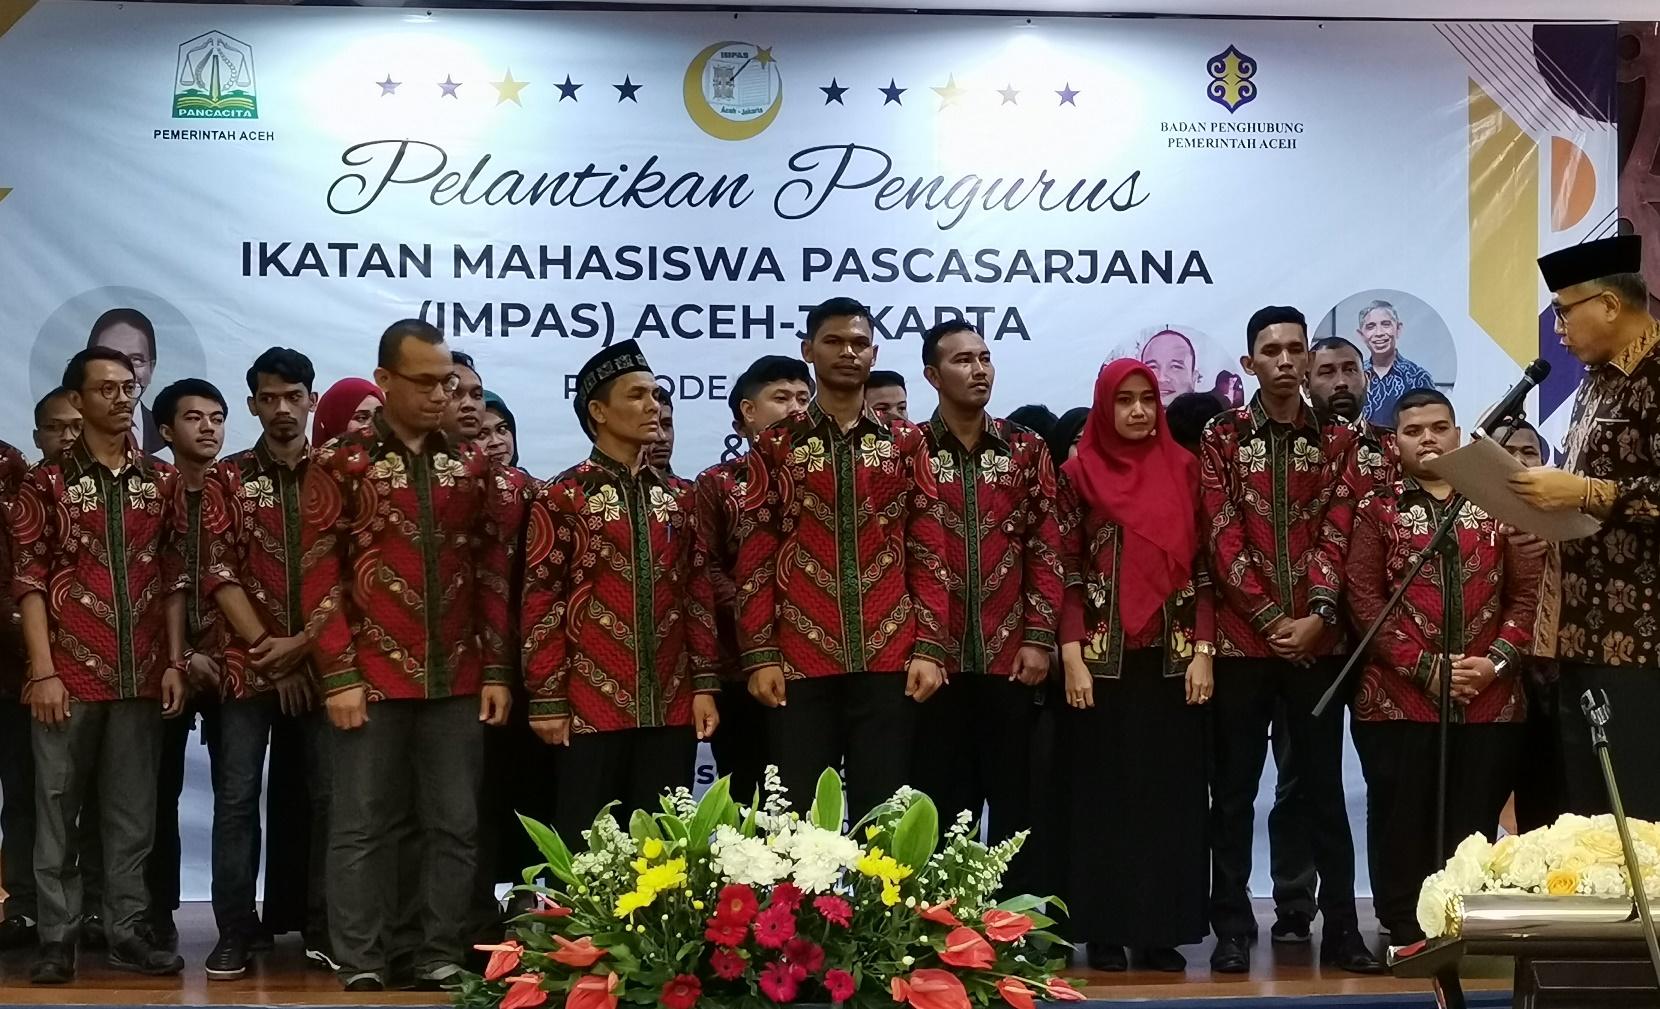 Yunidar ZA: 3 Fokus IMPAS Aceh-Jakarta